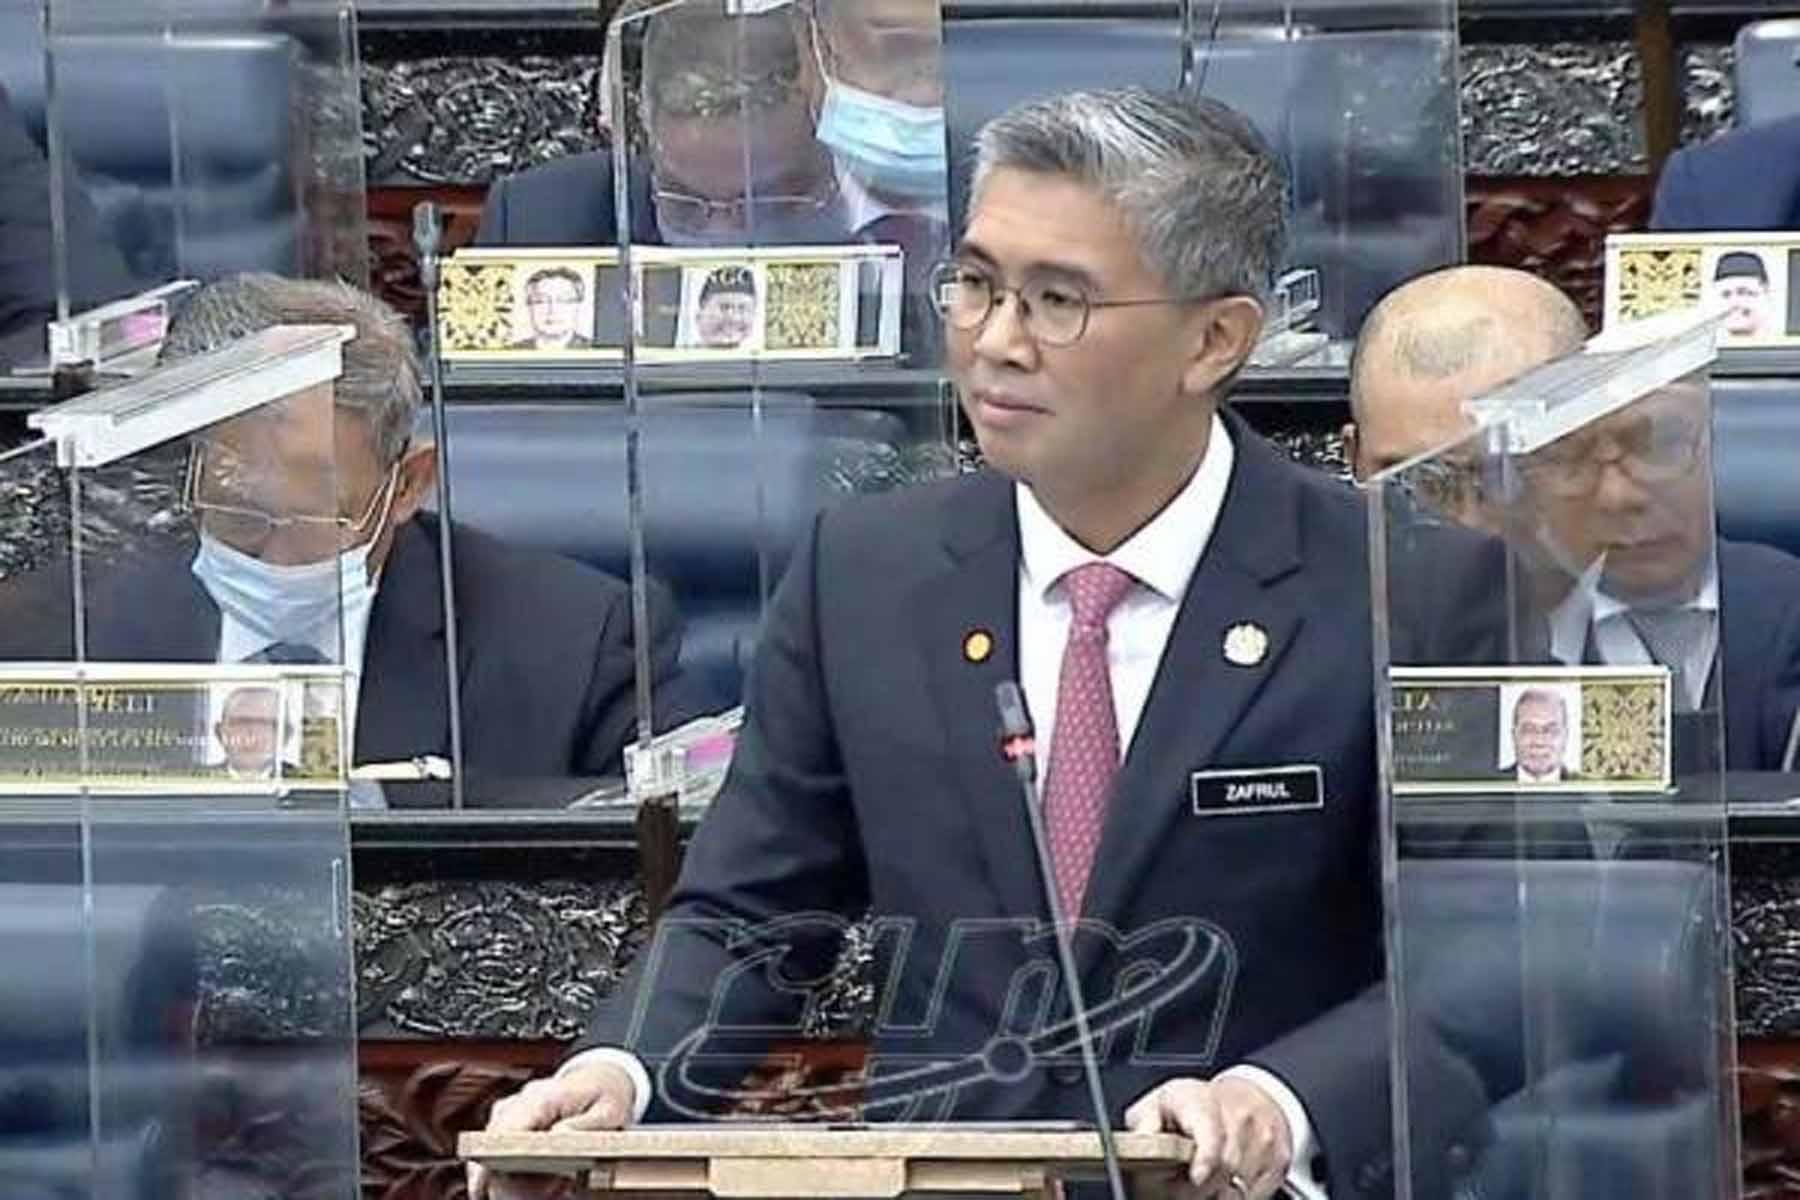 Kementerian Kewangan pantau untuk permudahkan moratorium bersasar